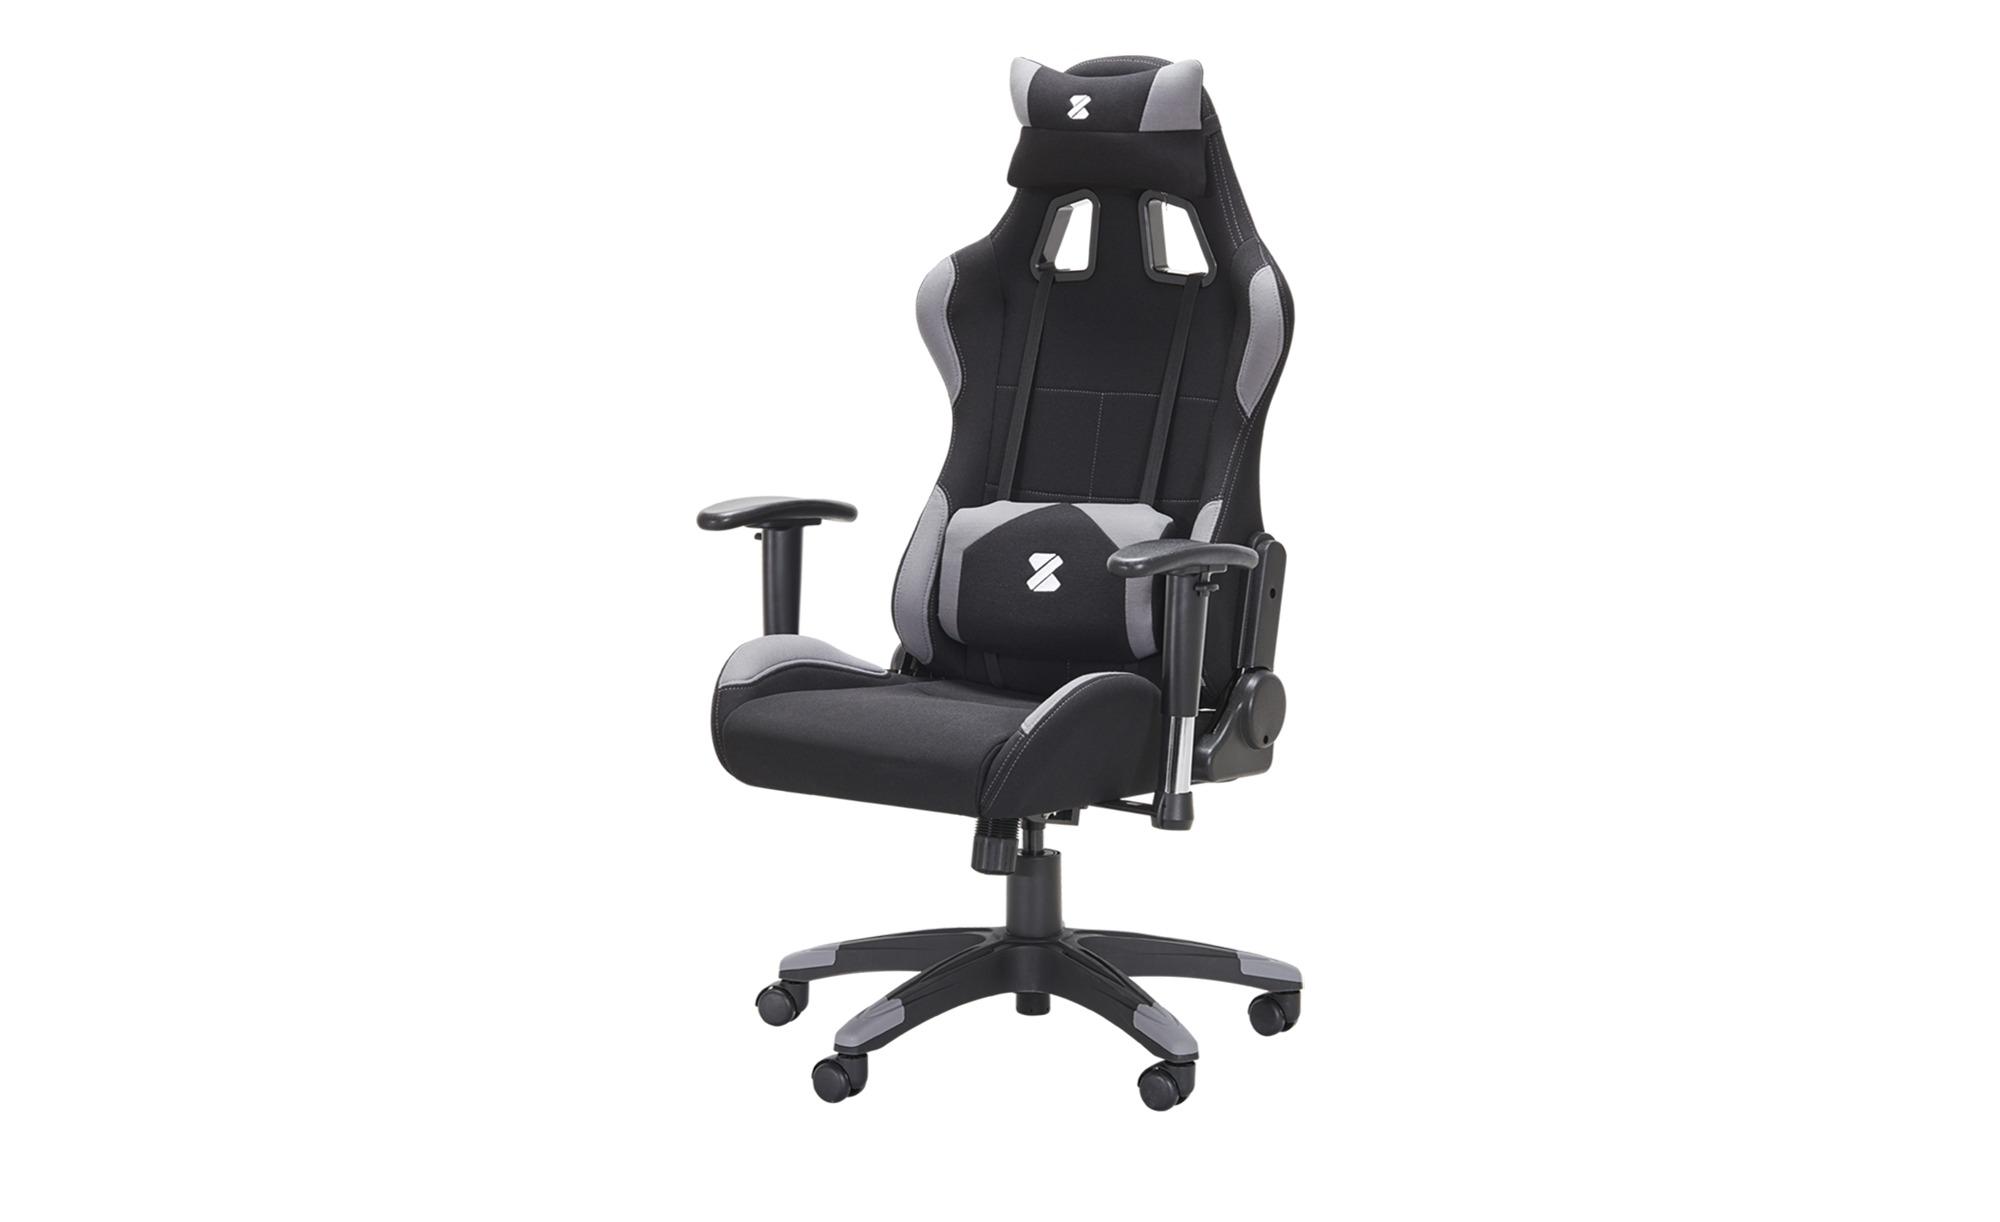 Gaming Möbel Bei SlGefunden Sessel Höffner Zocker OPkZX0N8nw